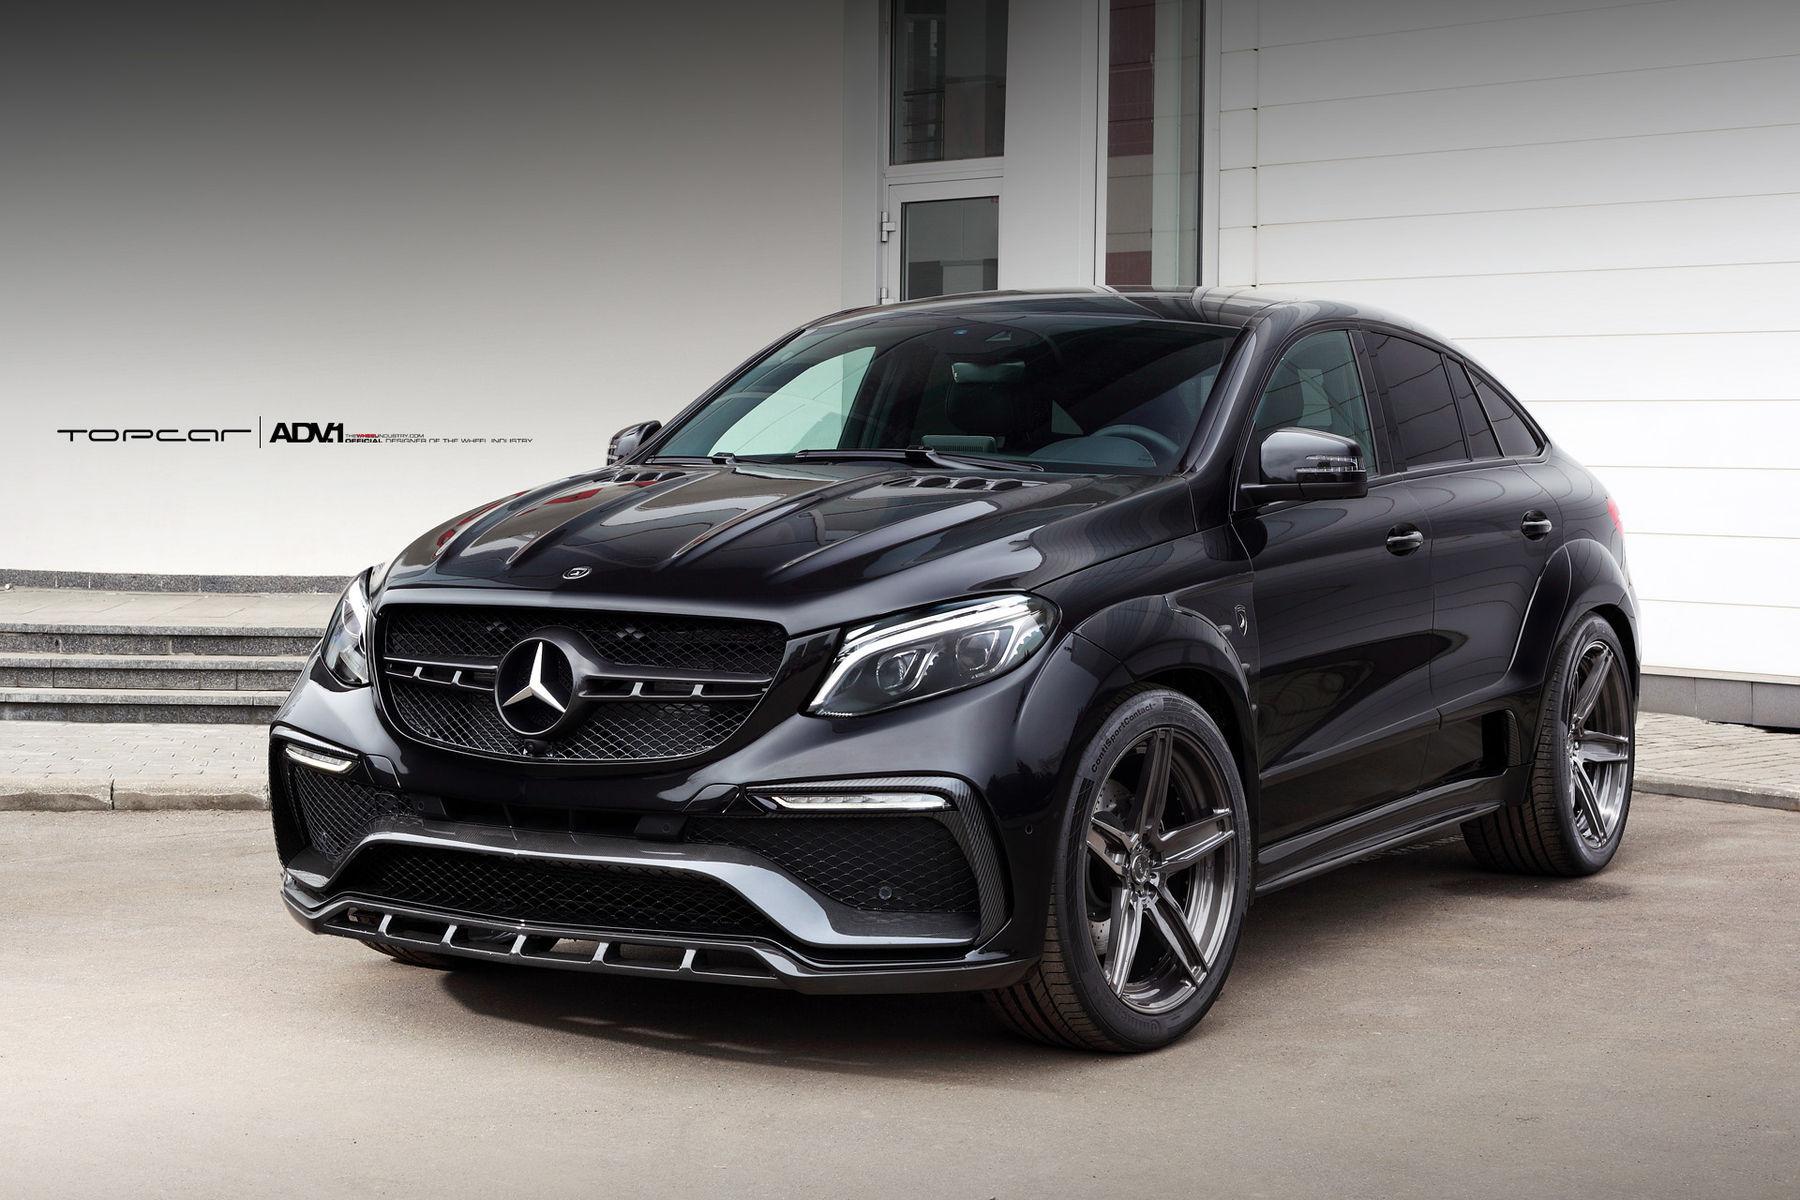 2016 Mercedes-Benz GL-Class | ADV.1 Wheels Mercedes GLE